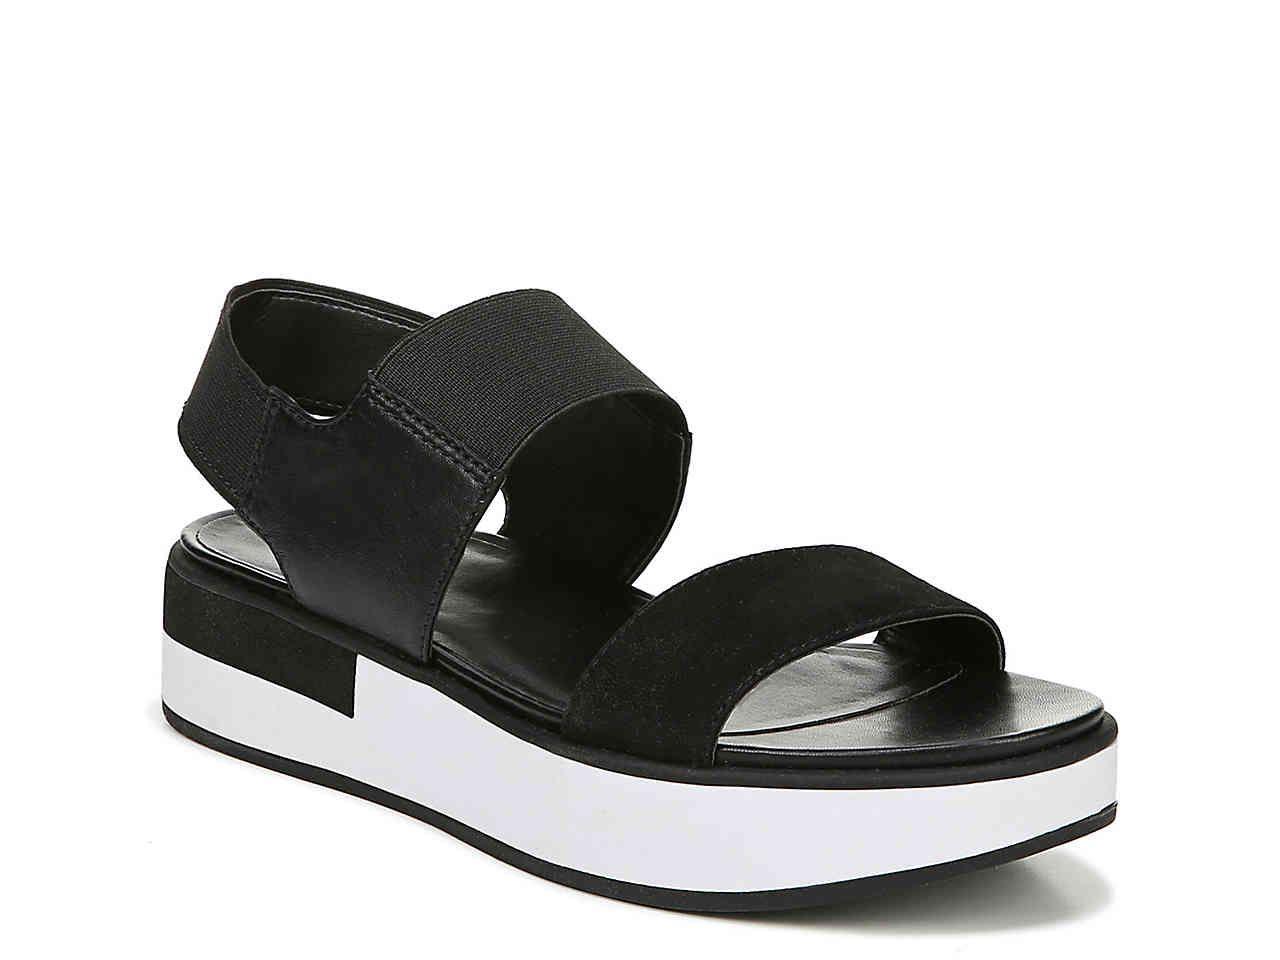 Naturalizer Carys Wedge Sandal Women's